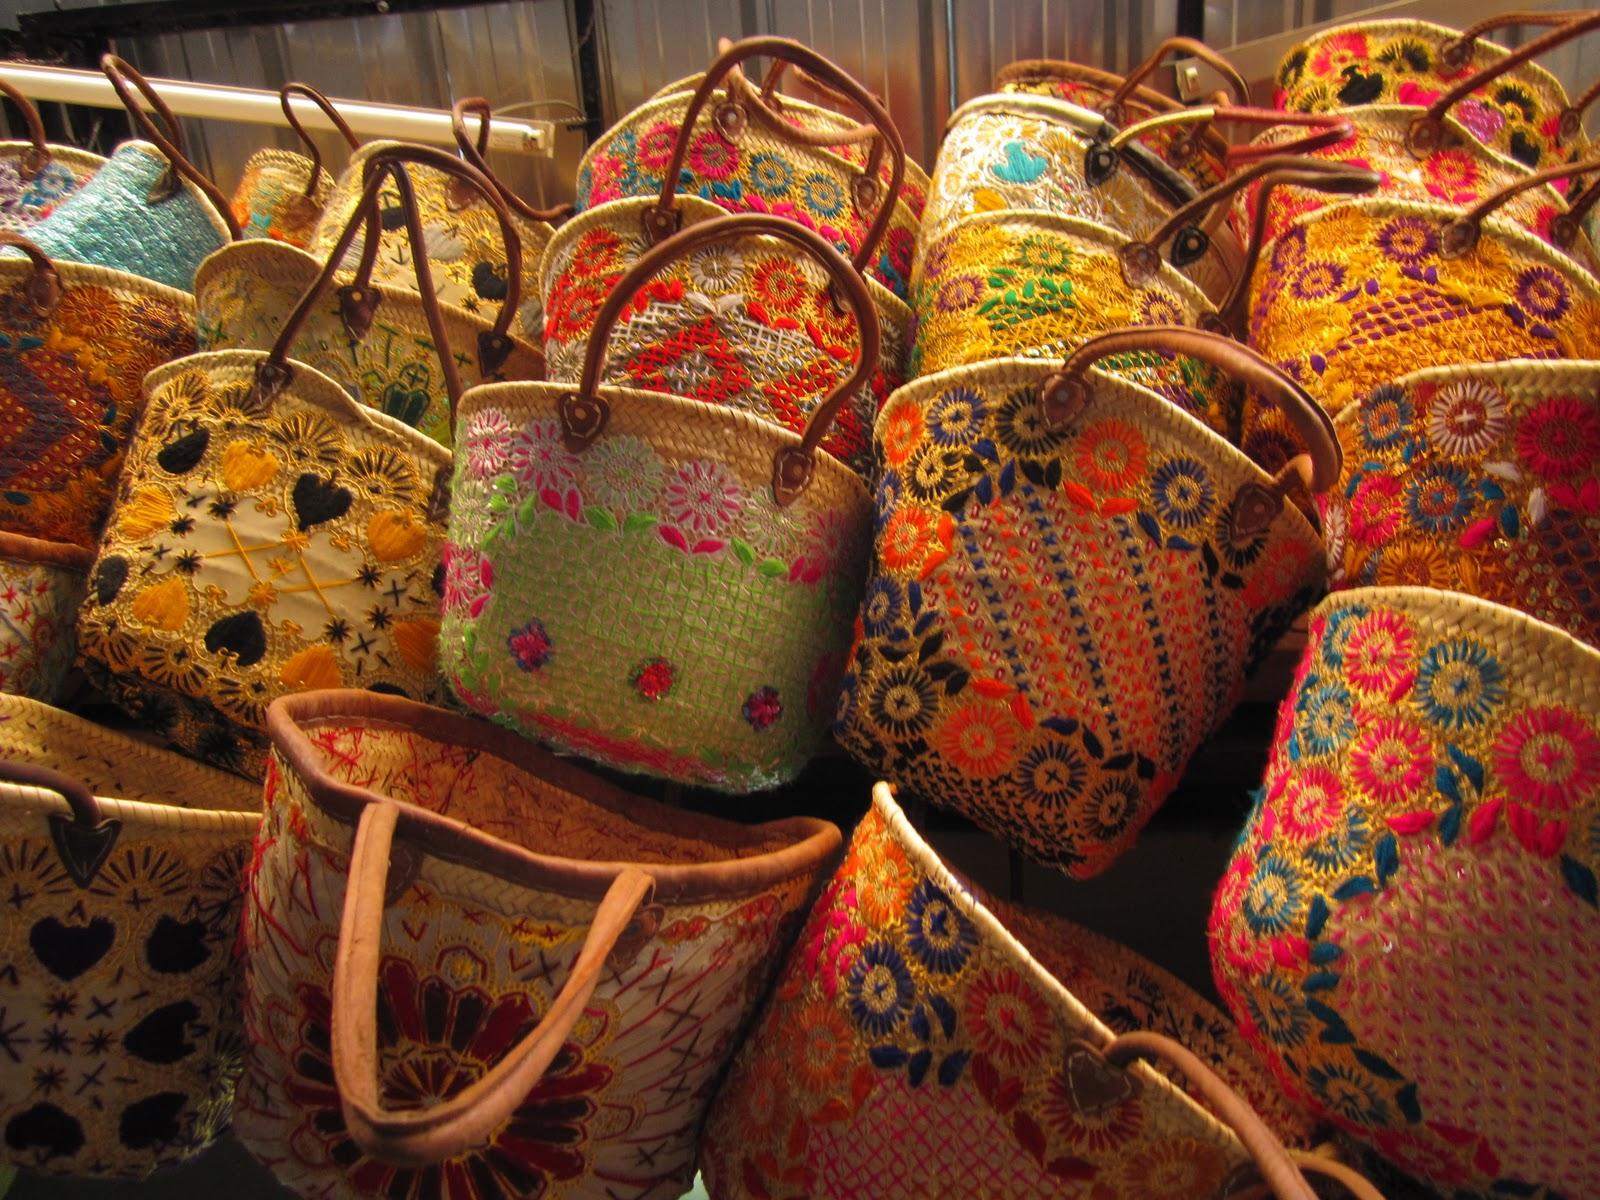 Moroccan baskets   morocco   Pinterest   Morocco, Moroccan and Marrakech